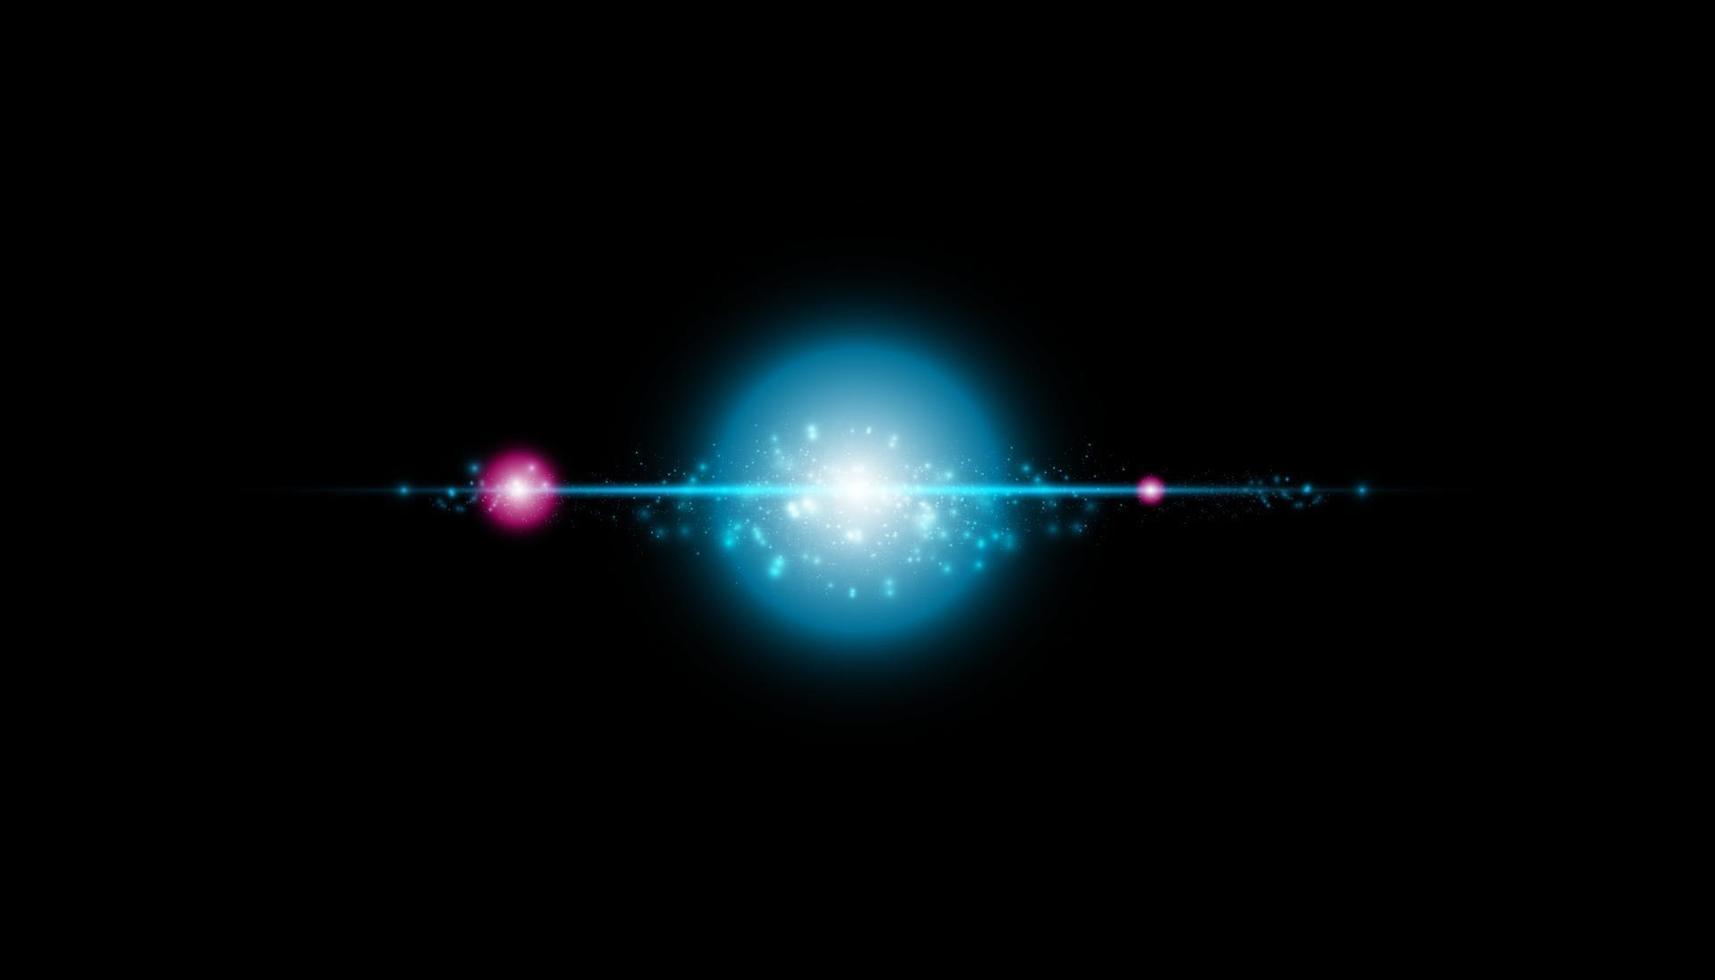 gloed geïsoleerd blauw transparant effect, lensflare, explosie, glitter, vector